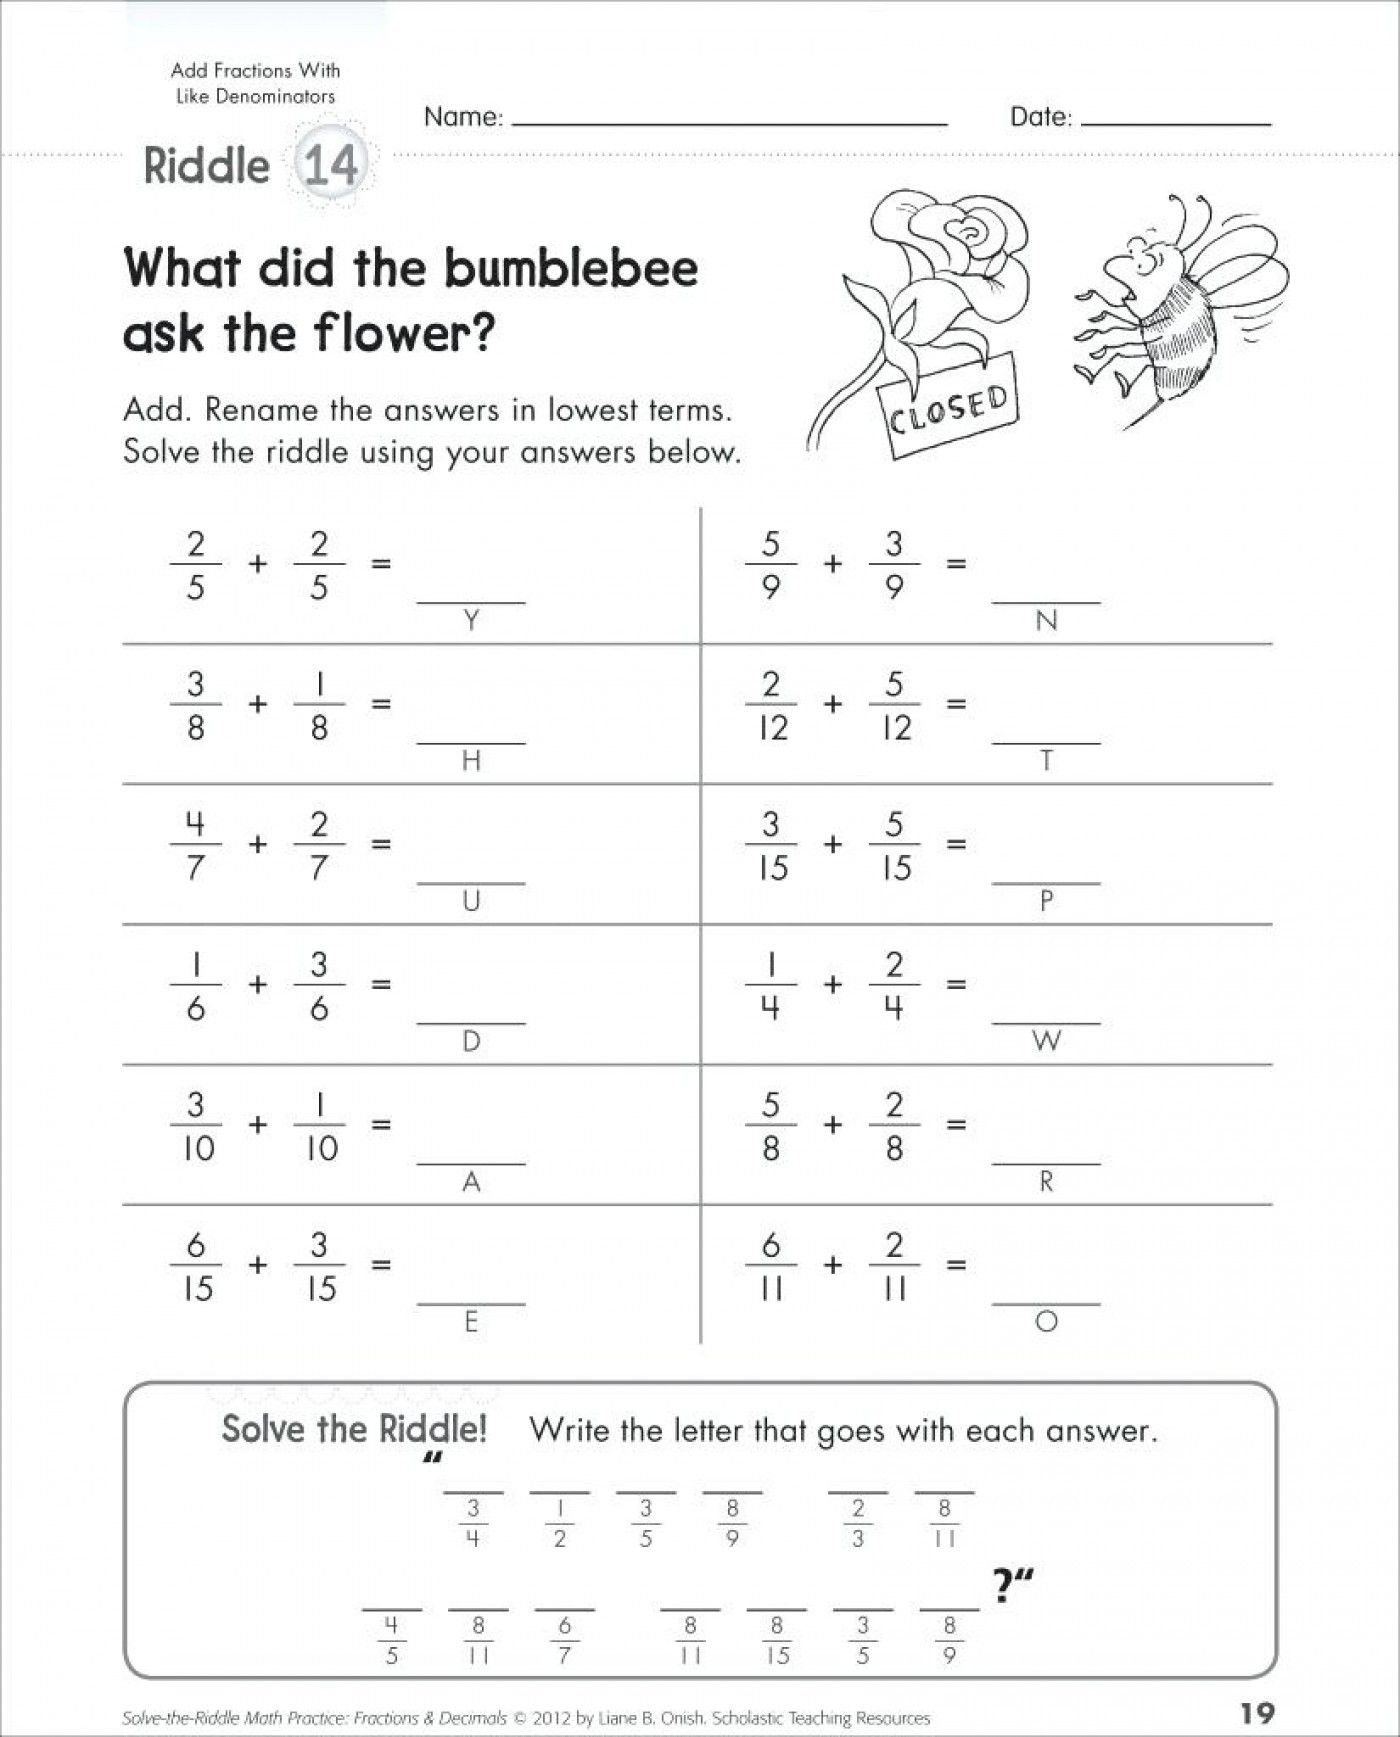 5 Free Math Worksheets Second Grade 2 Addition Add 2 Digit Plus 1 Digit Missing Addend No Reg In 2020 Fractions Worksheets Math Fractions Worksheets Math Fractions